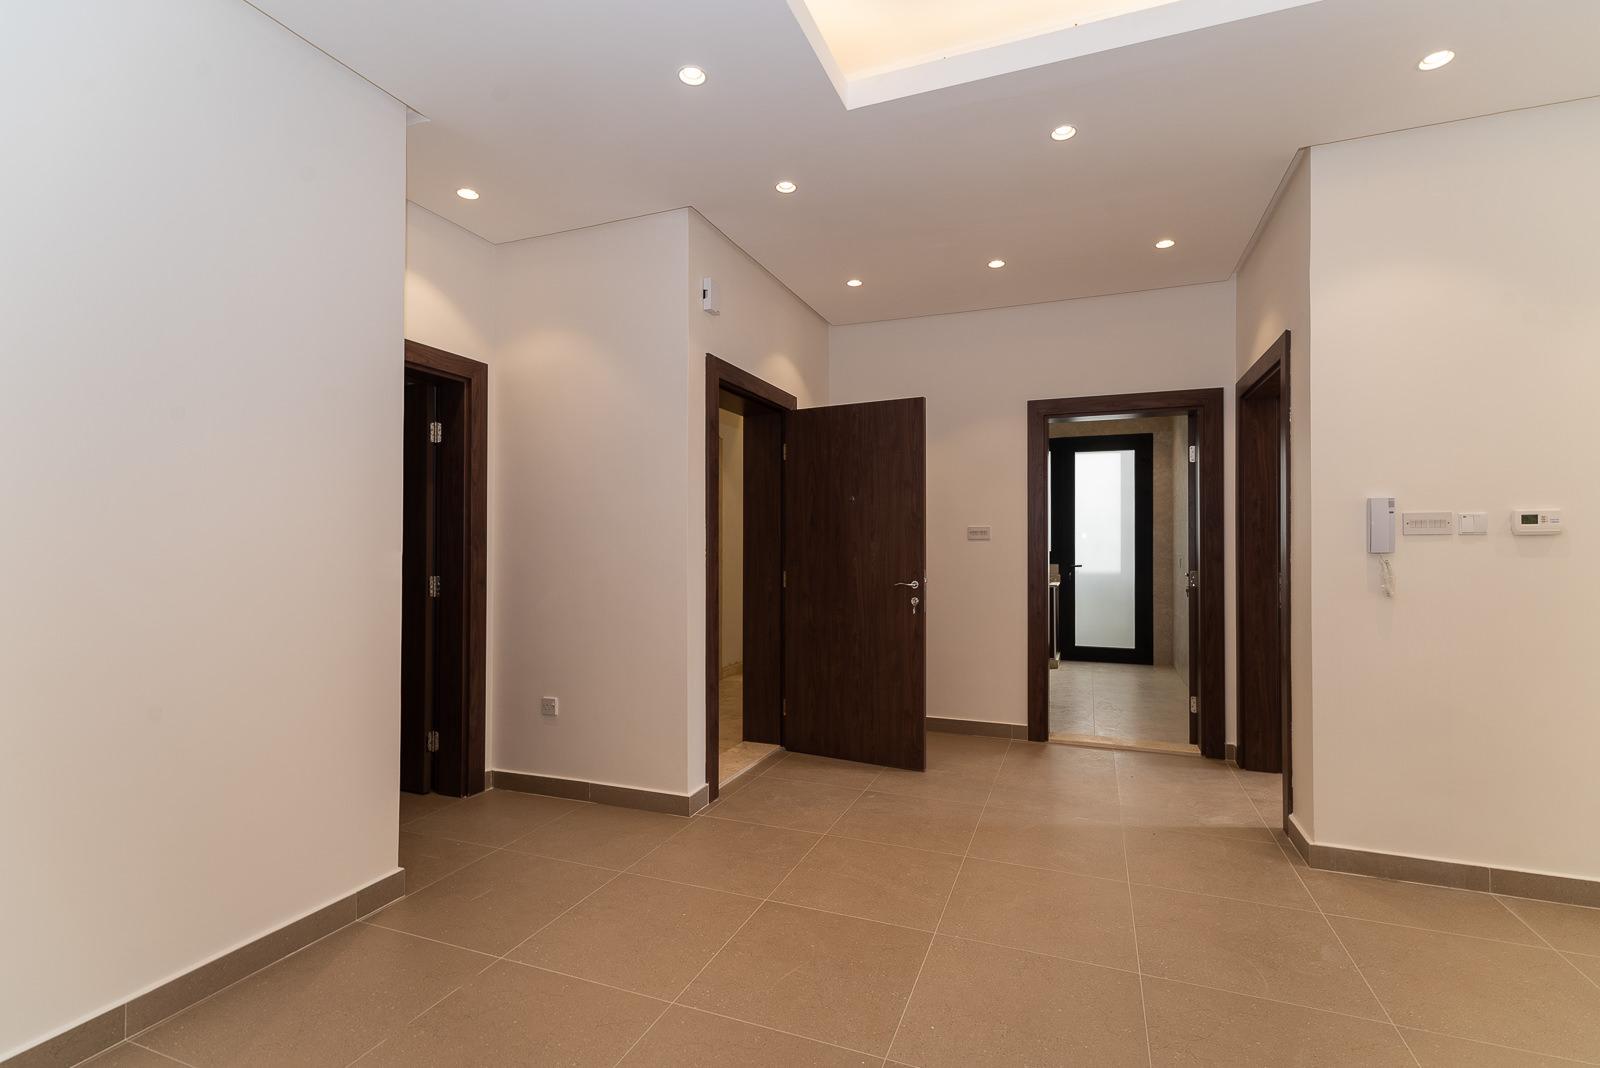 Fnaitees – great, new, three bedroom apartment